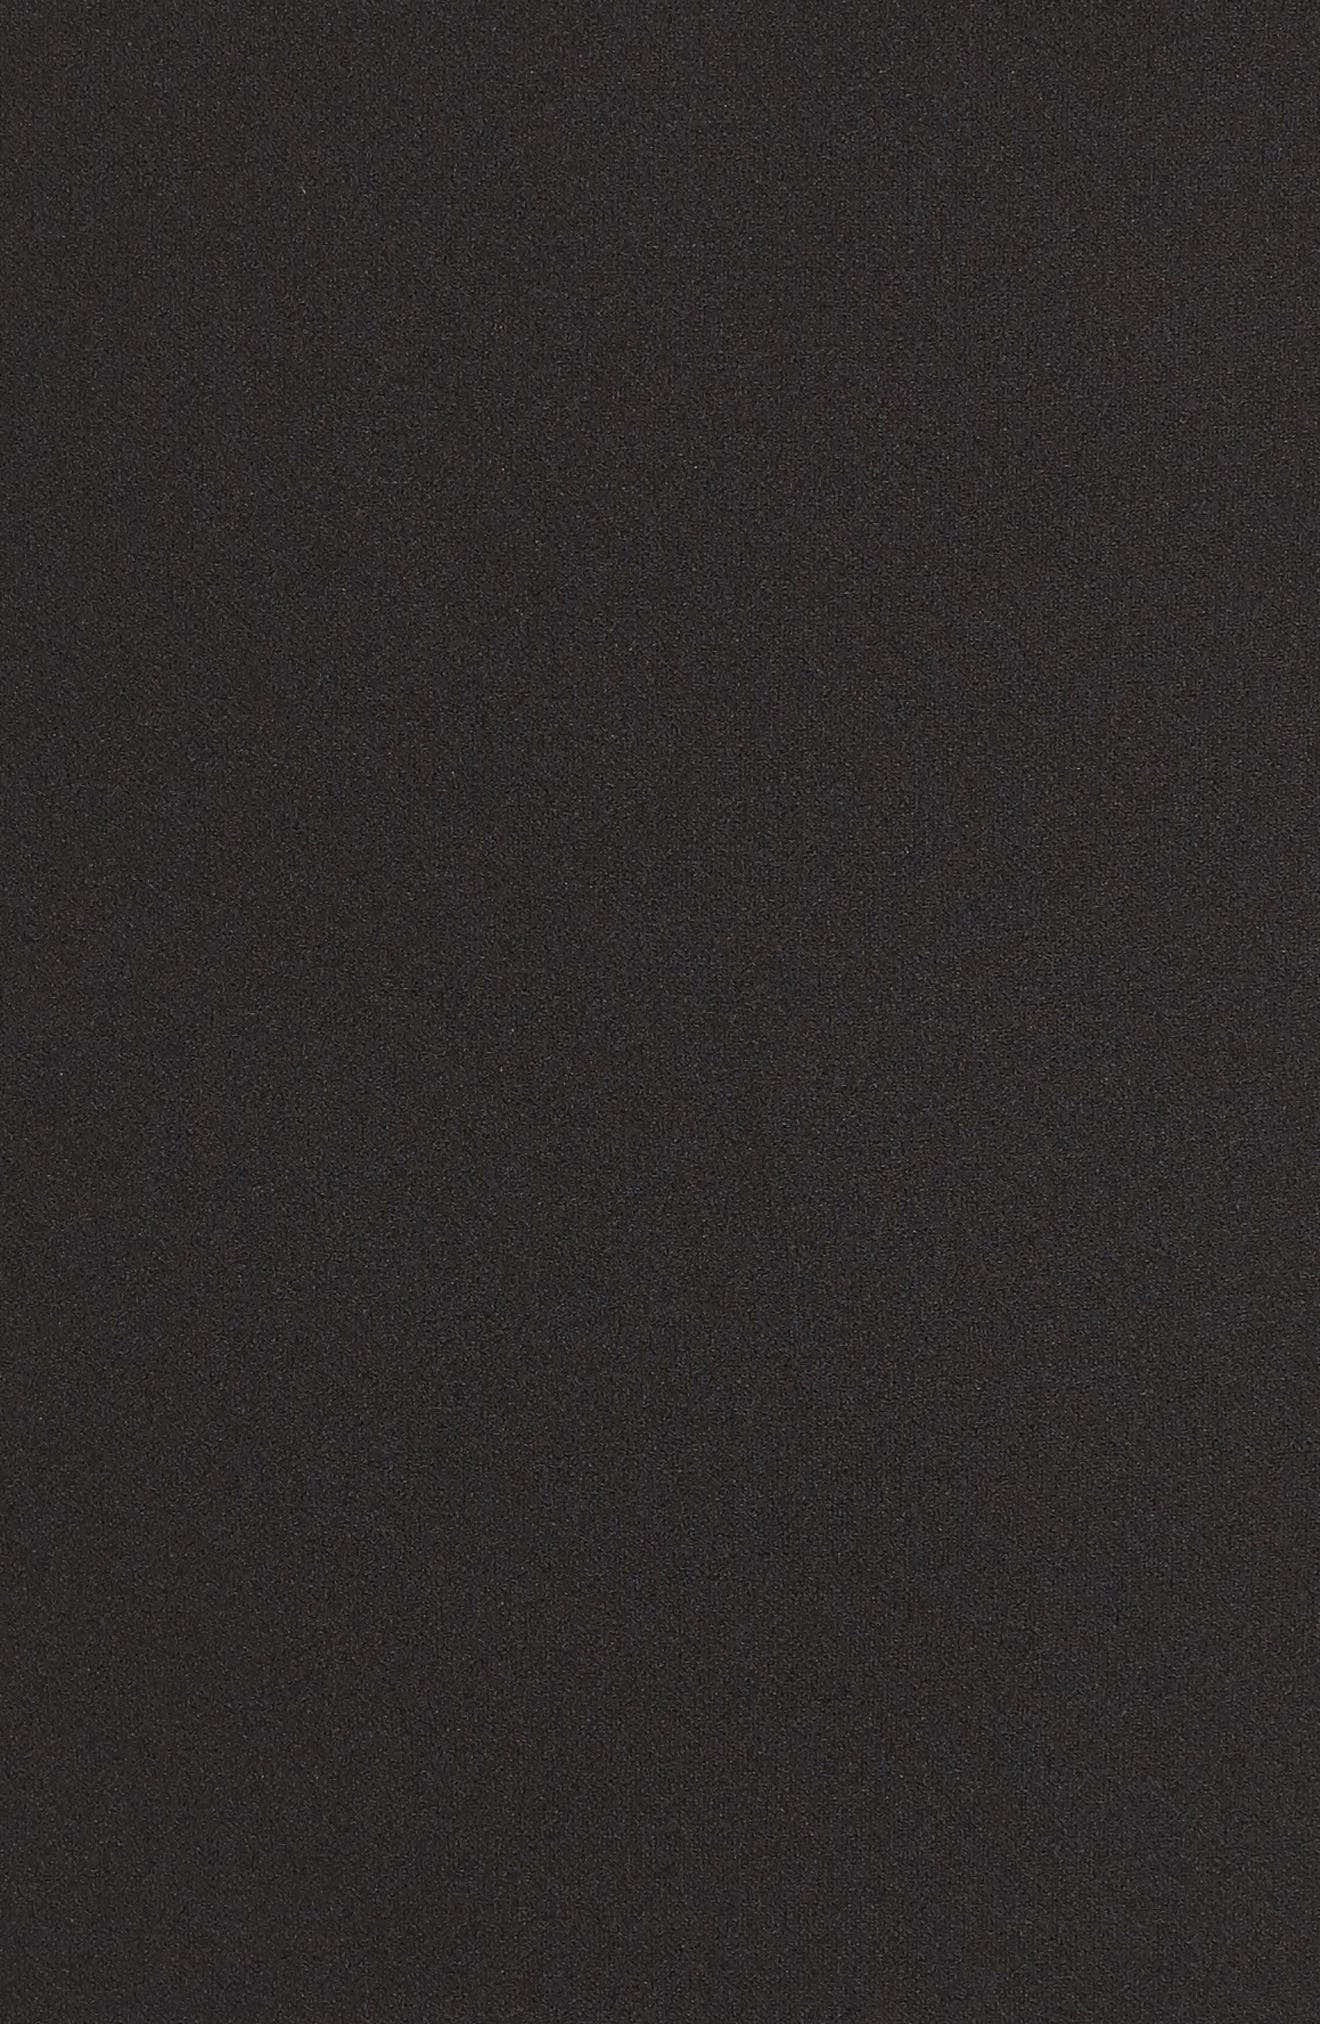 LULUS, Bead Neck Mermaid Gown, Alternate thumbnail 6, color, BLACK